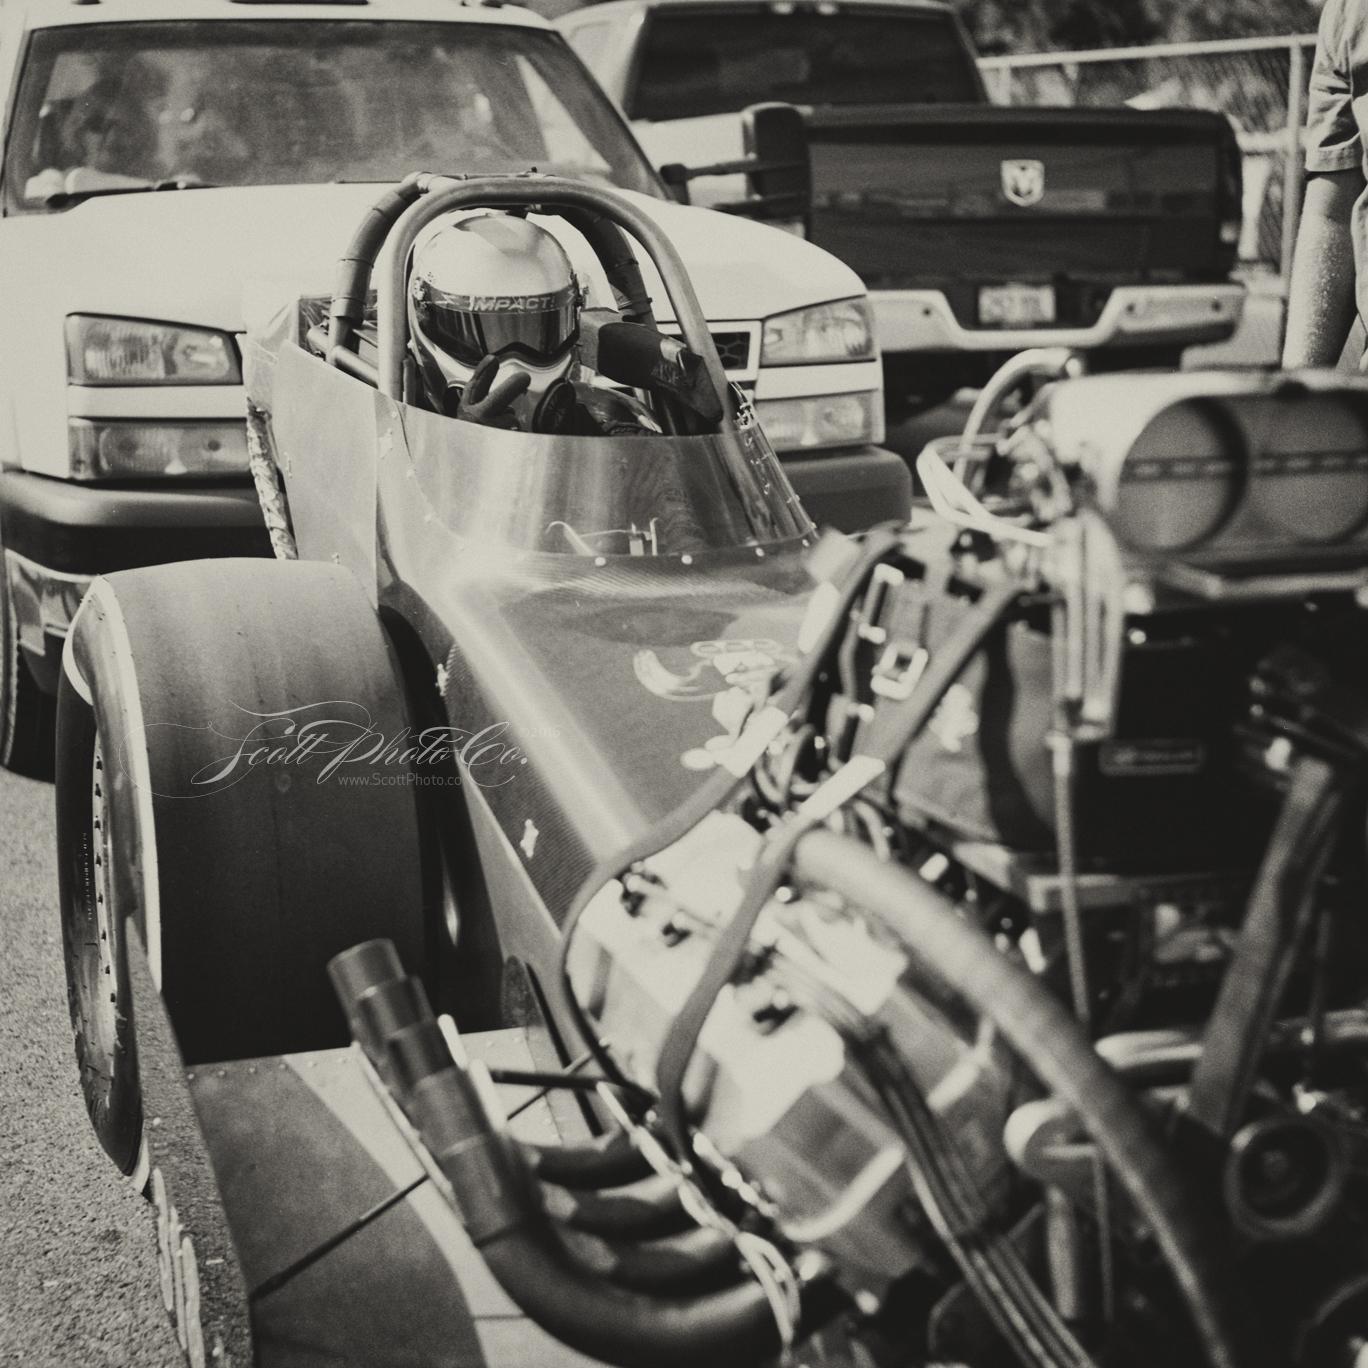 HRR_2014_ScottPhotoCo_Drivers_6_SPC.jpg